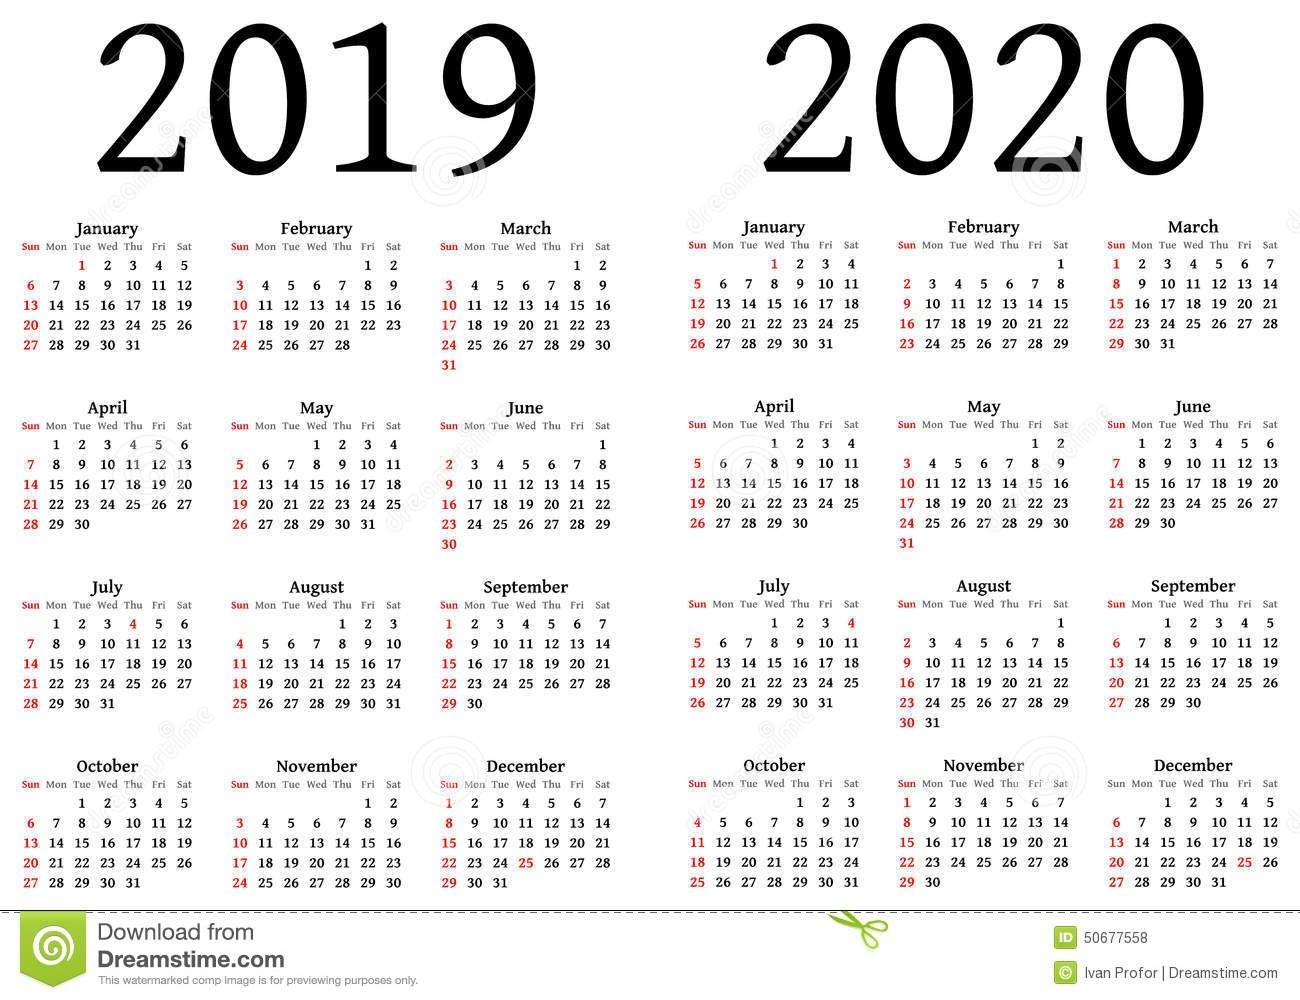 Calendar For 2019 And 2020 Stock Vector. Illustration Of Designers Calendar 2019 Eps